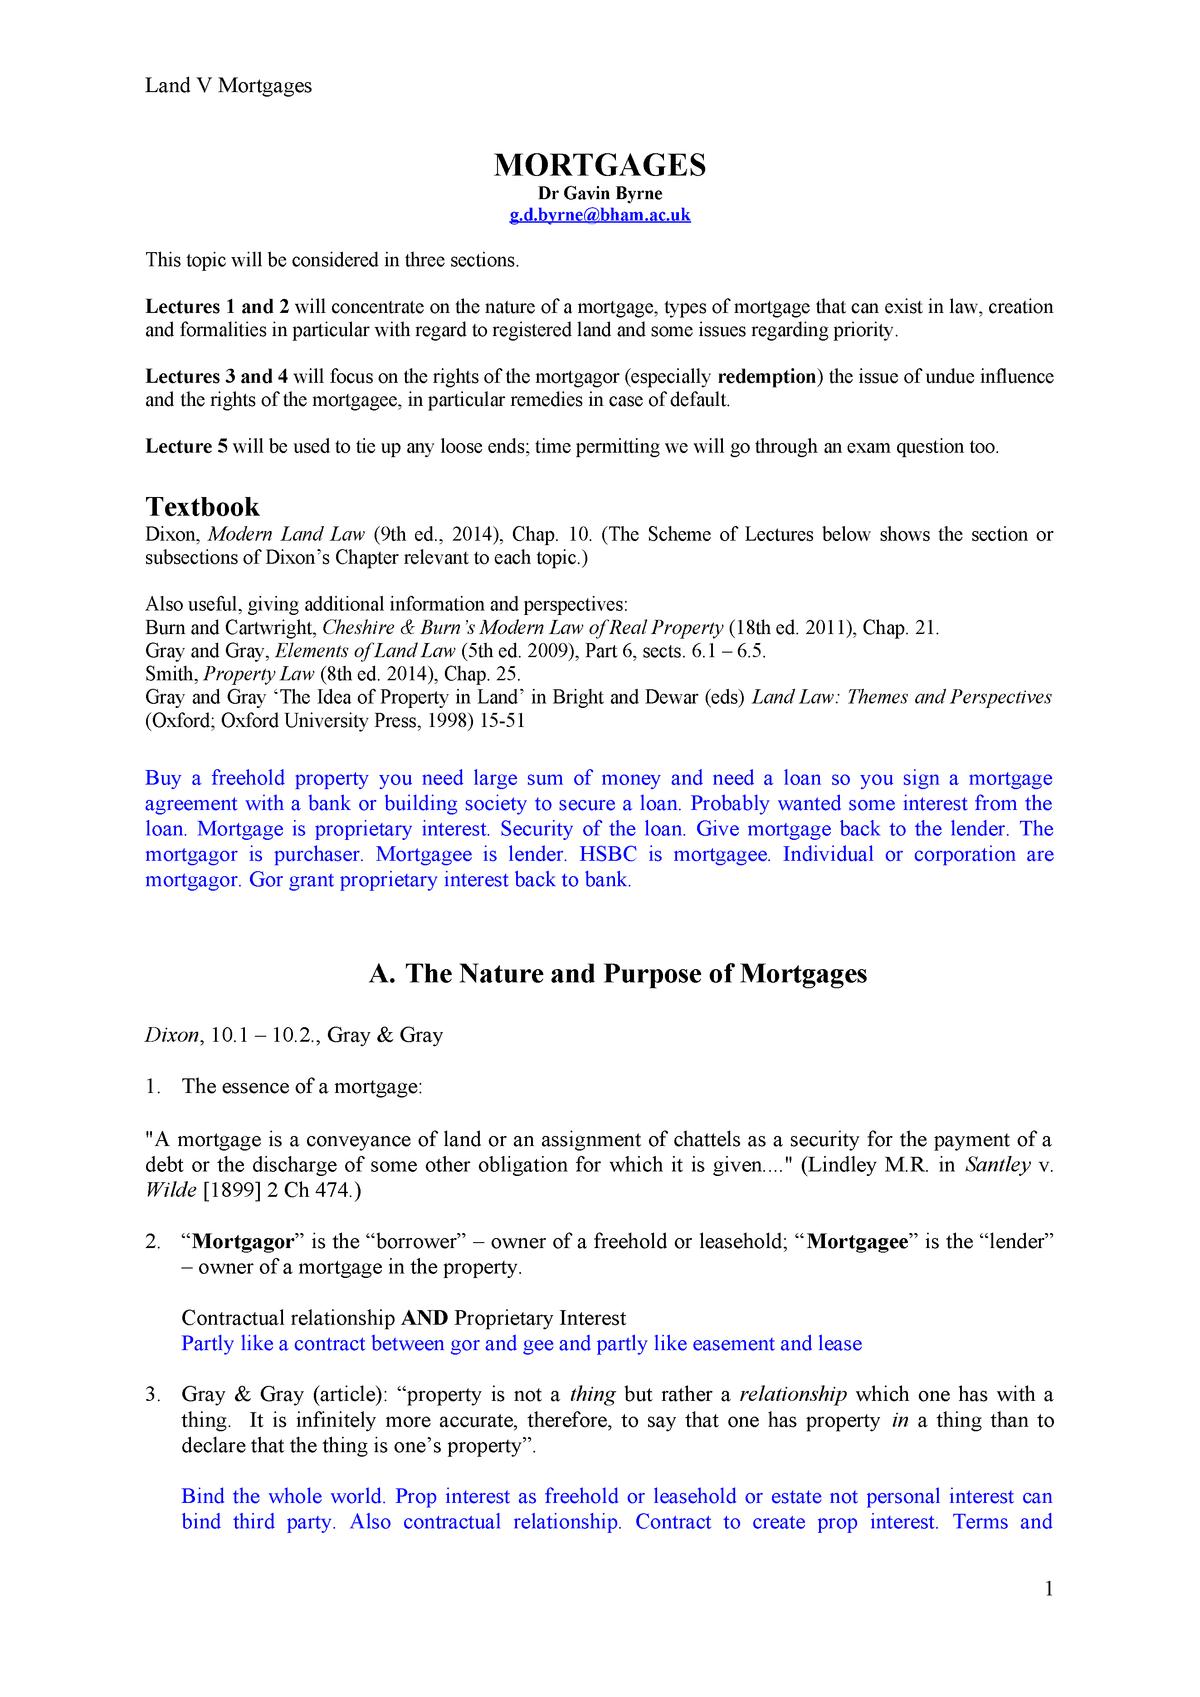 Mortgages - Summary Land Law - Land Law 08 21215 - StuDocu